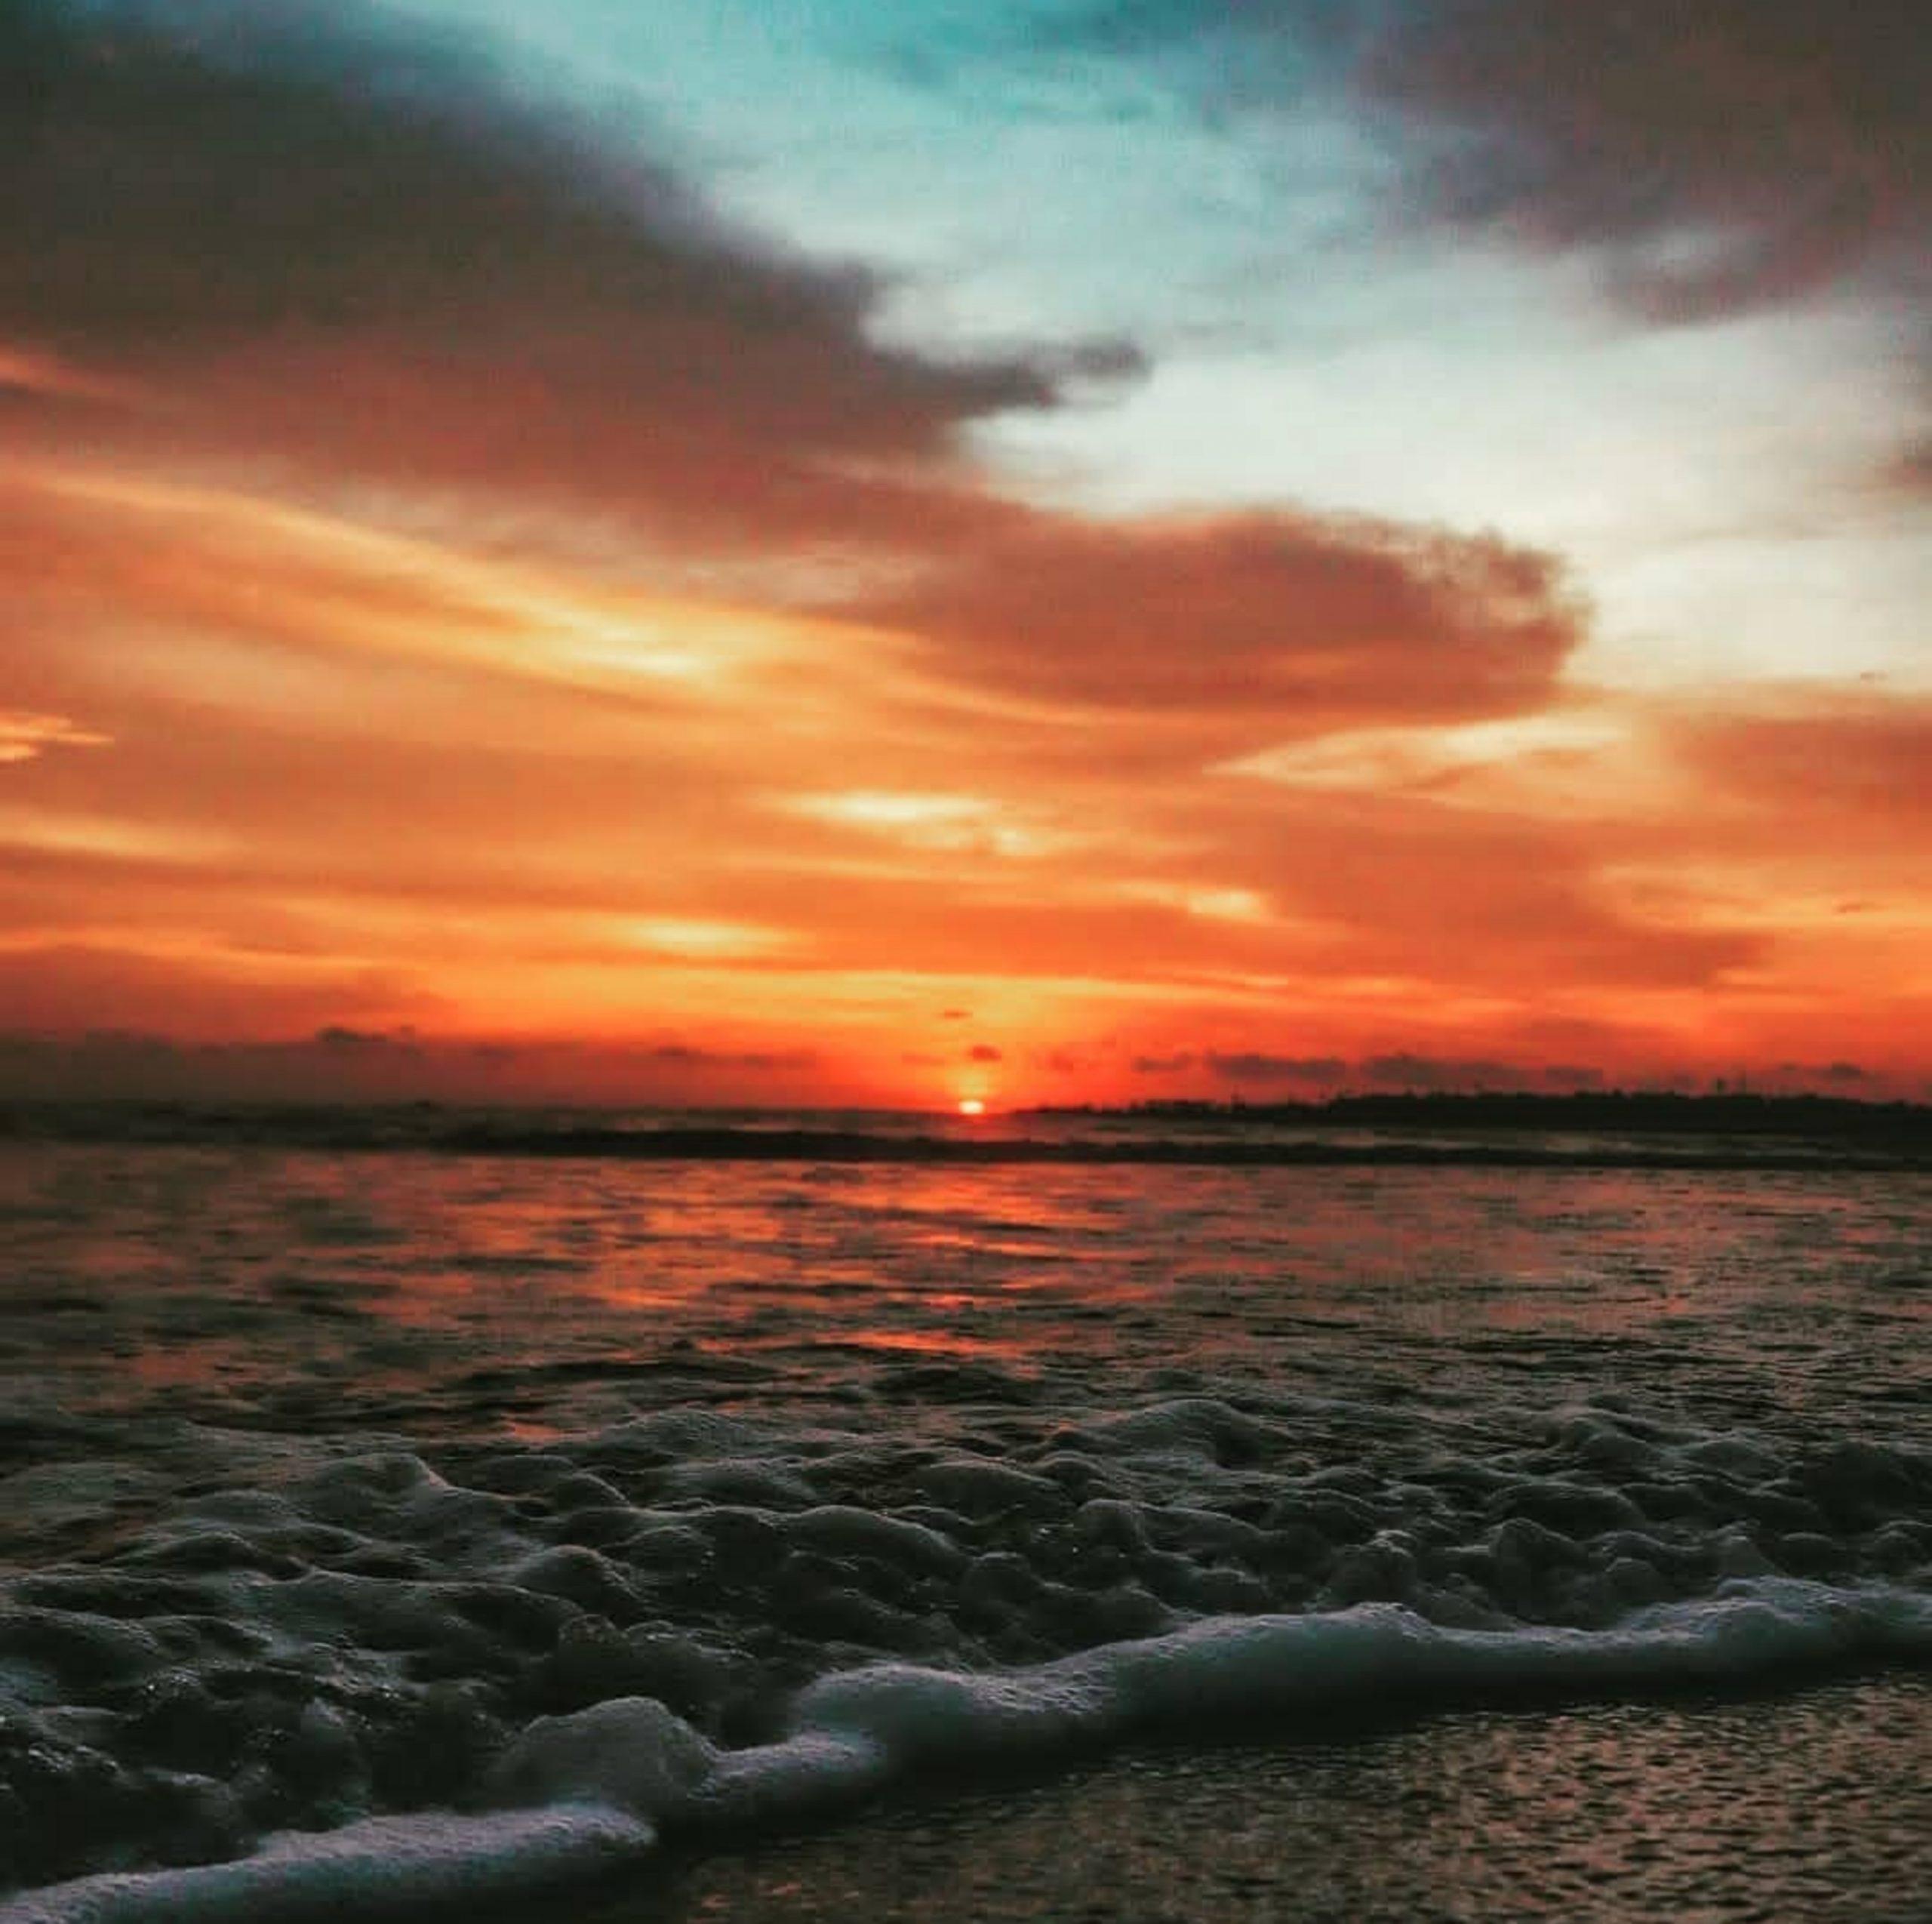 Sunset through a beach